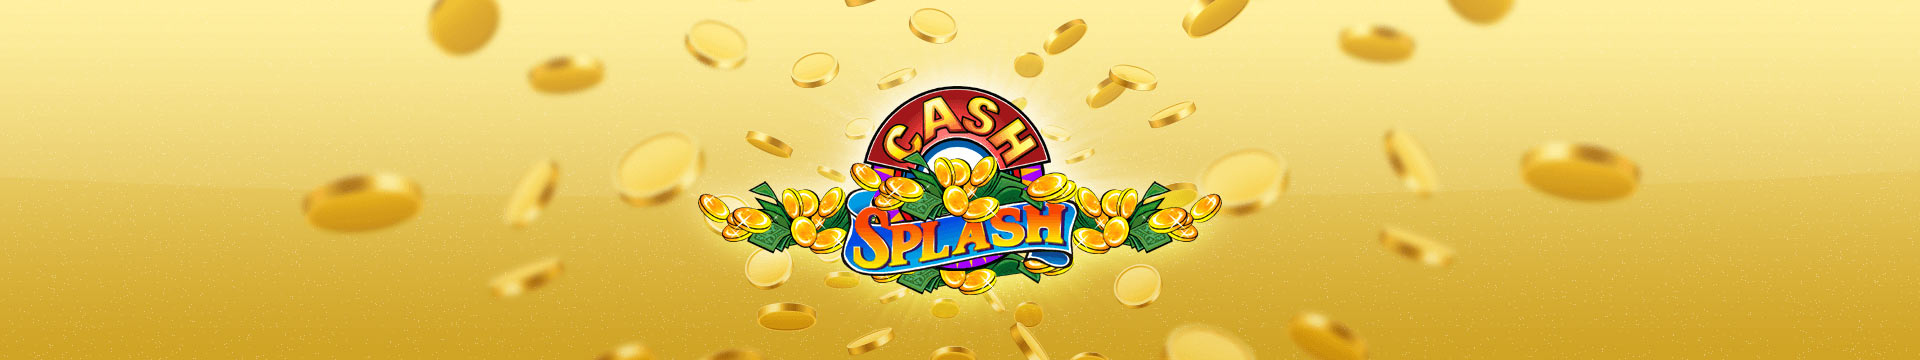 Slider Banner - Cash Splash